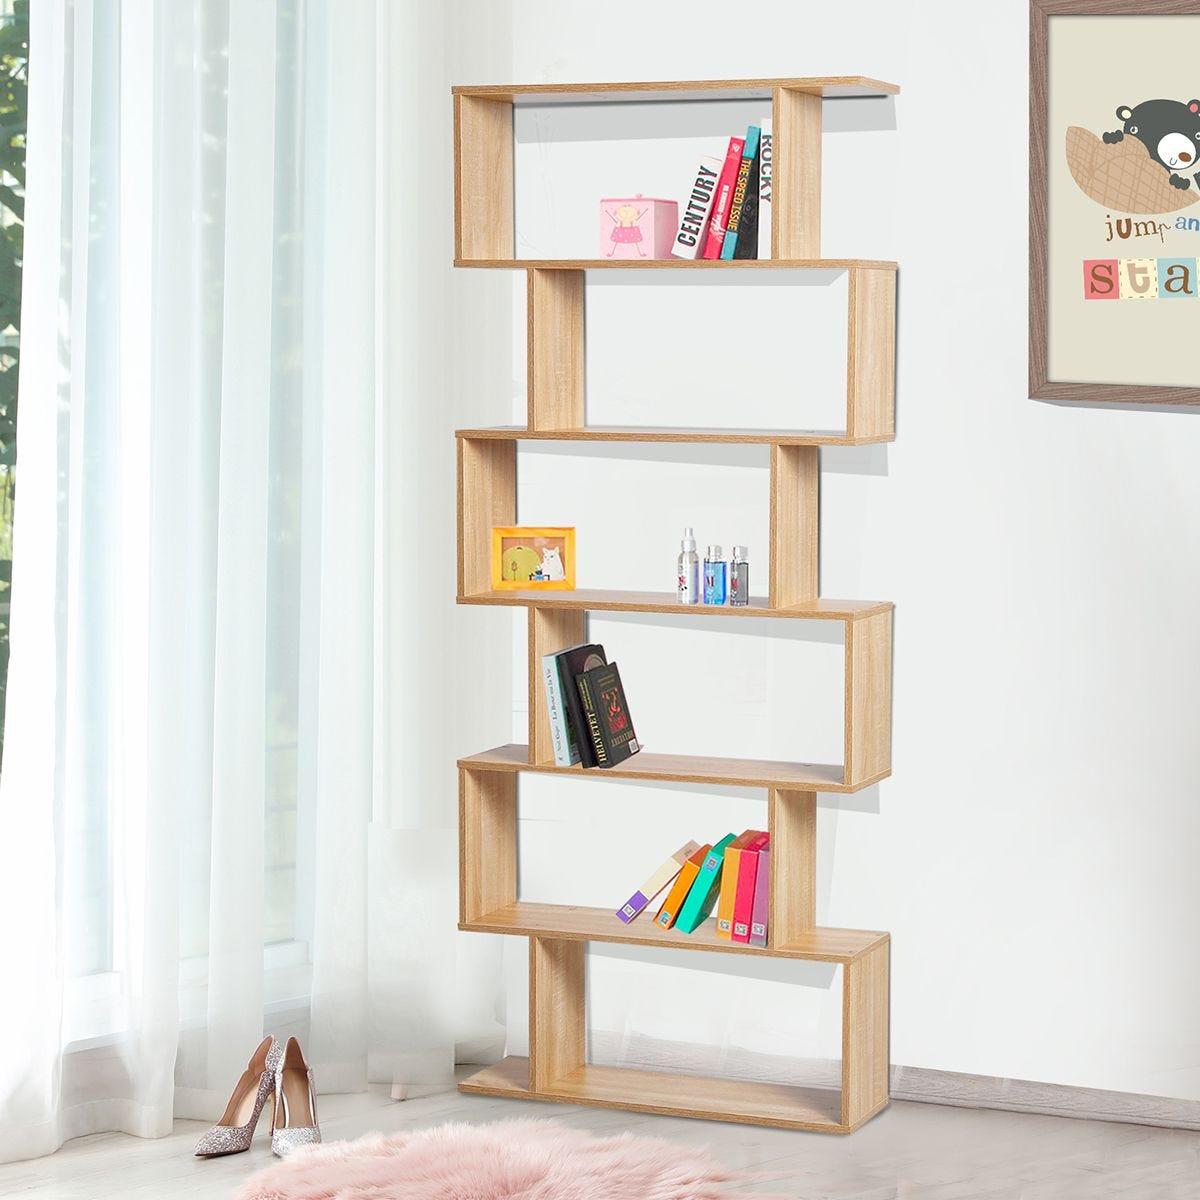 6 Tier Storage Shelf Modern S-Shape Design Stand Unit Storage Display Oak Effect